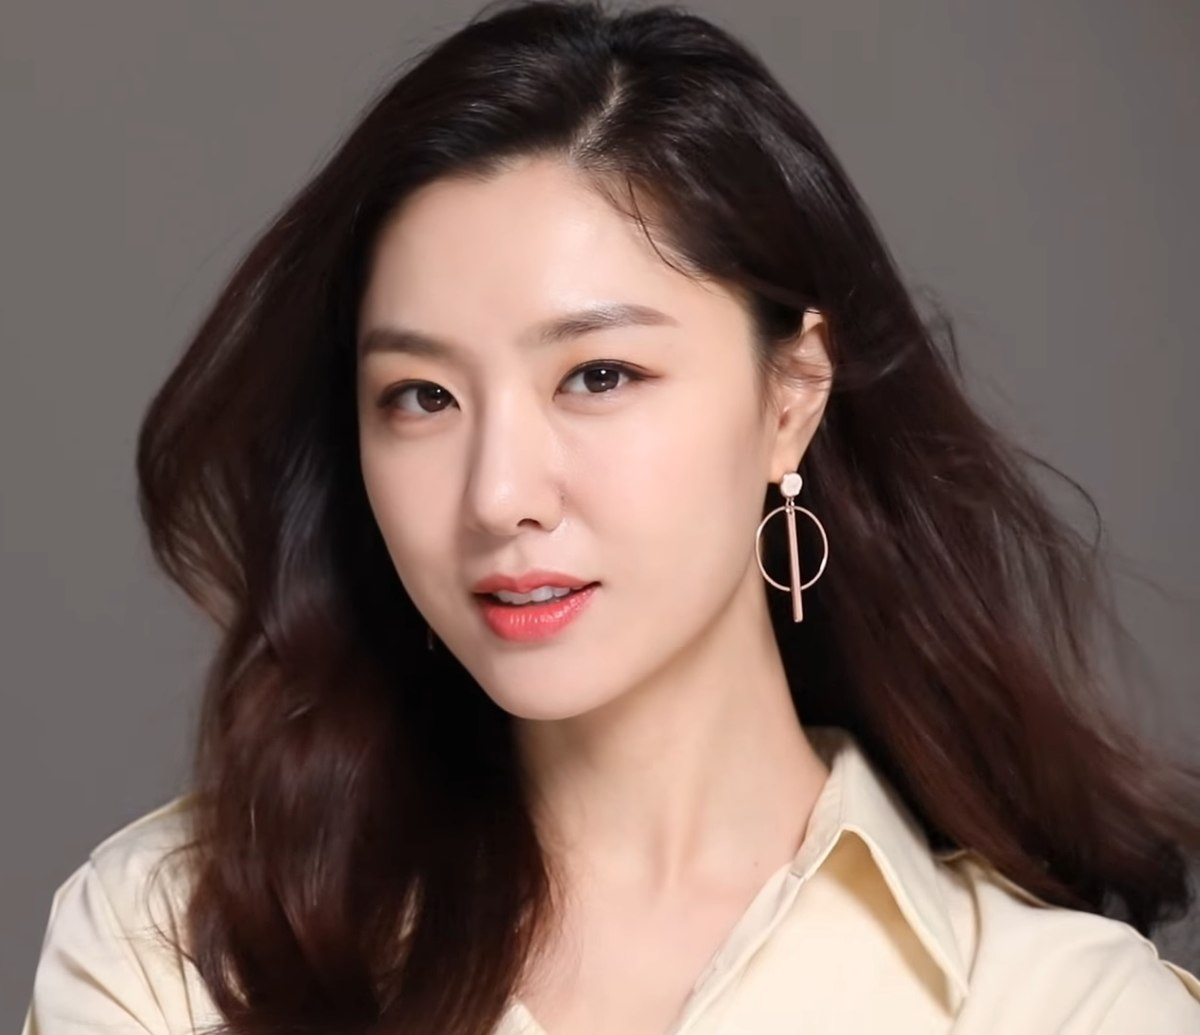 Seo Ji-hye - Wikipedia